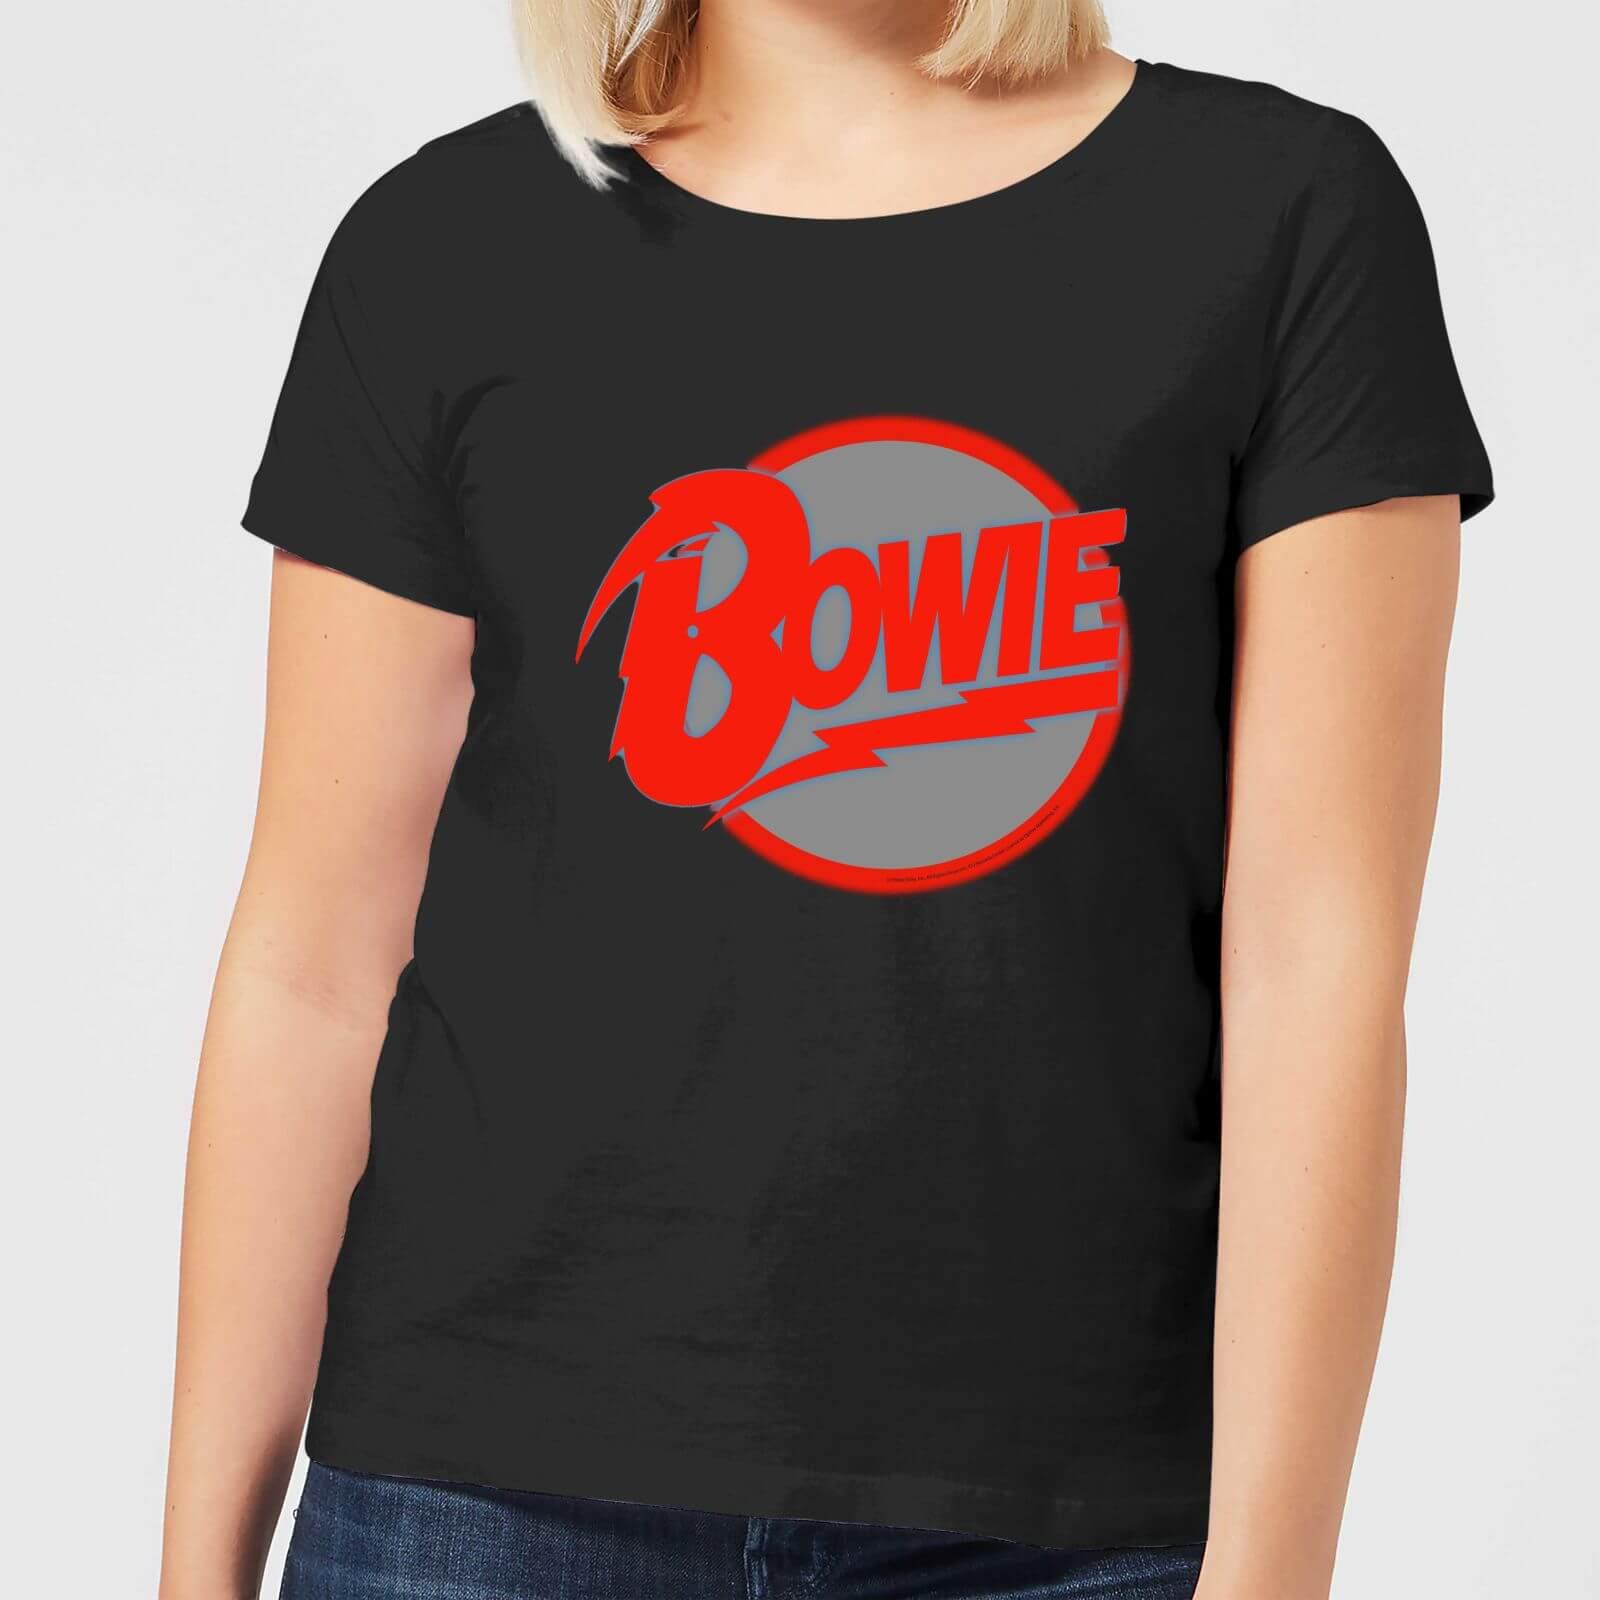 David Bowie Diamond Dogs Women's T-Shirt - Black - L - Black